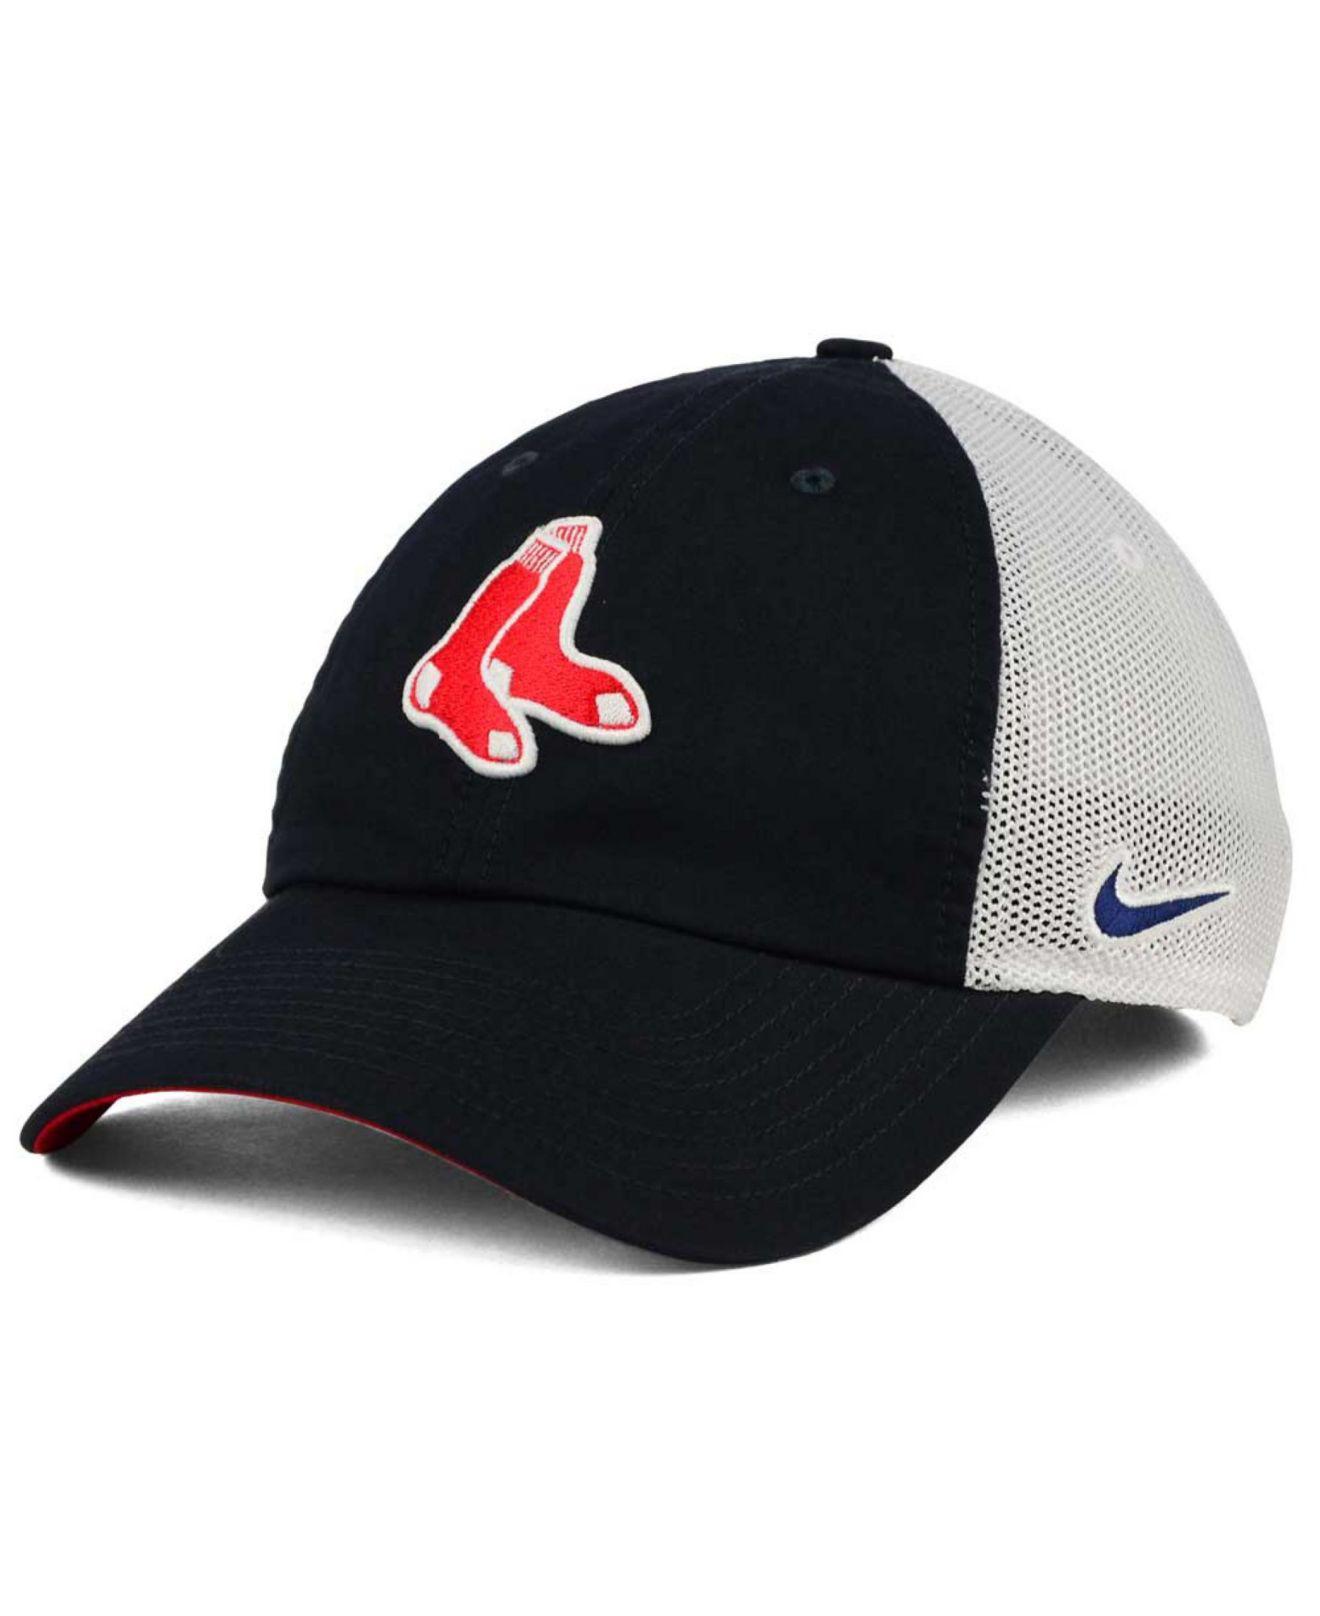 Lyst - Nike Boston Red Sox Dri-fit Mesh Swoosh Adjustable Cap in ... e8e4fb87a26